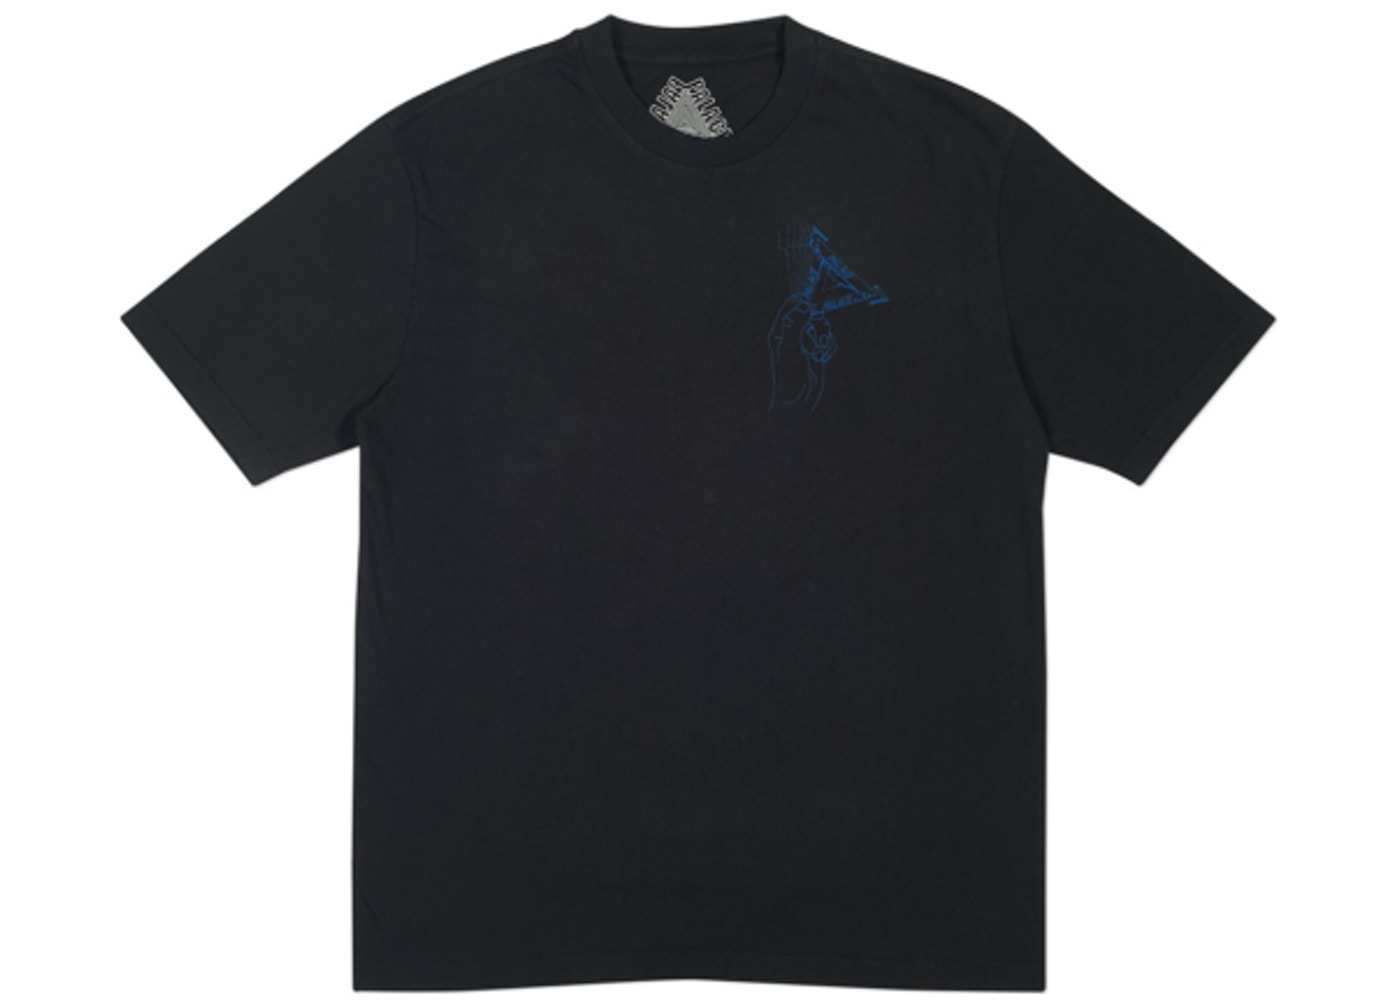 361b8bee Palace Grand Master T-Shirt Black - FW18